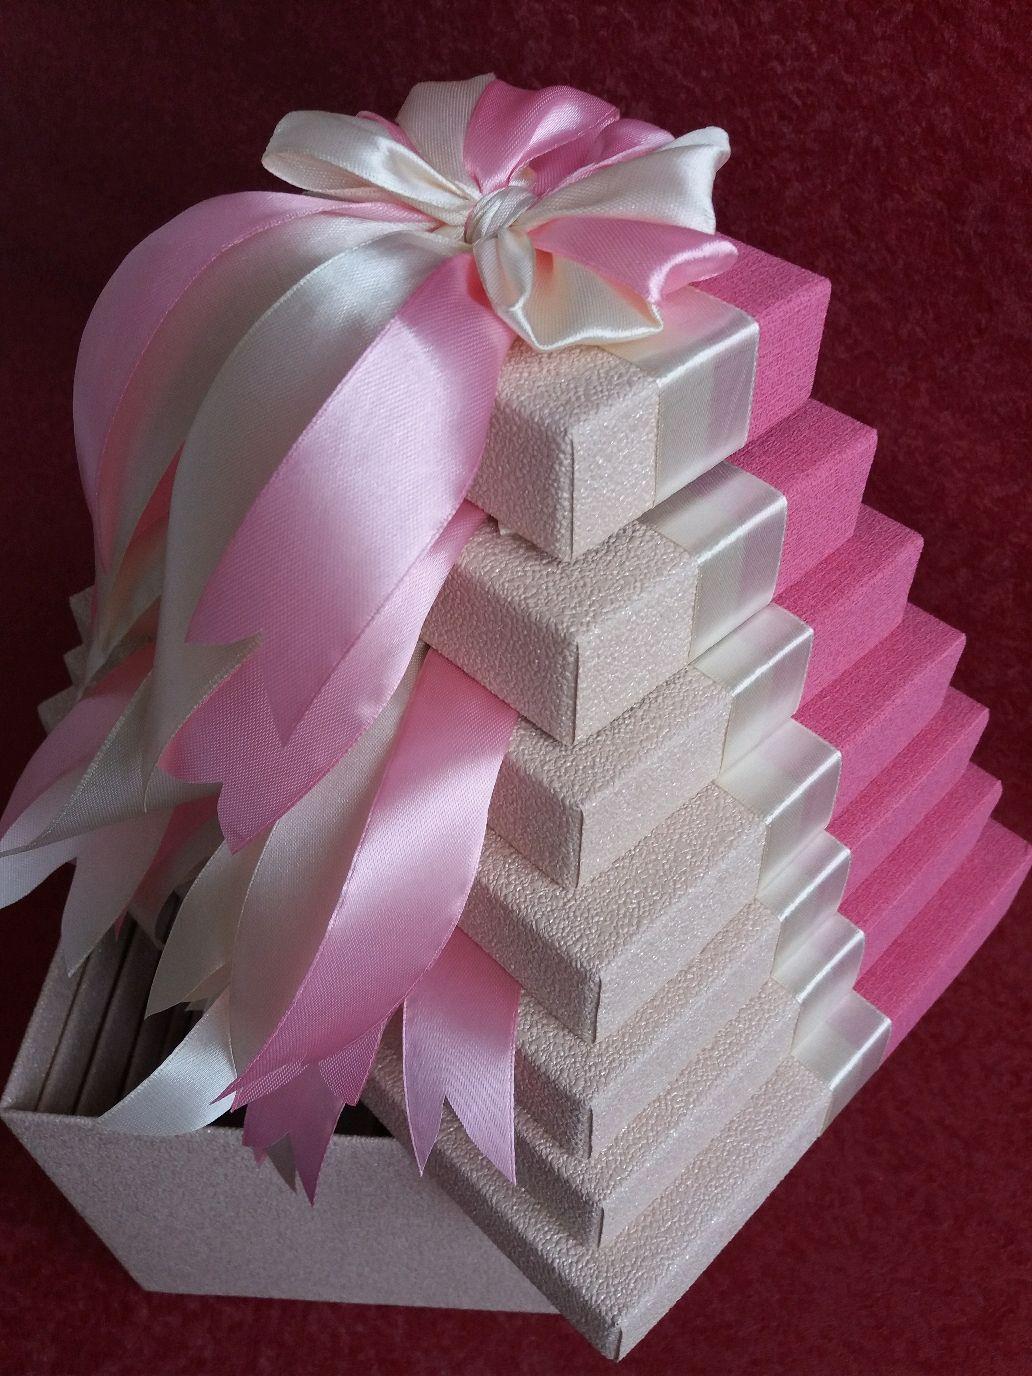 Картинки по запросу подарок в коробке матрешка